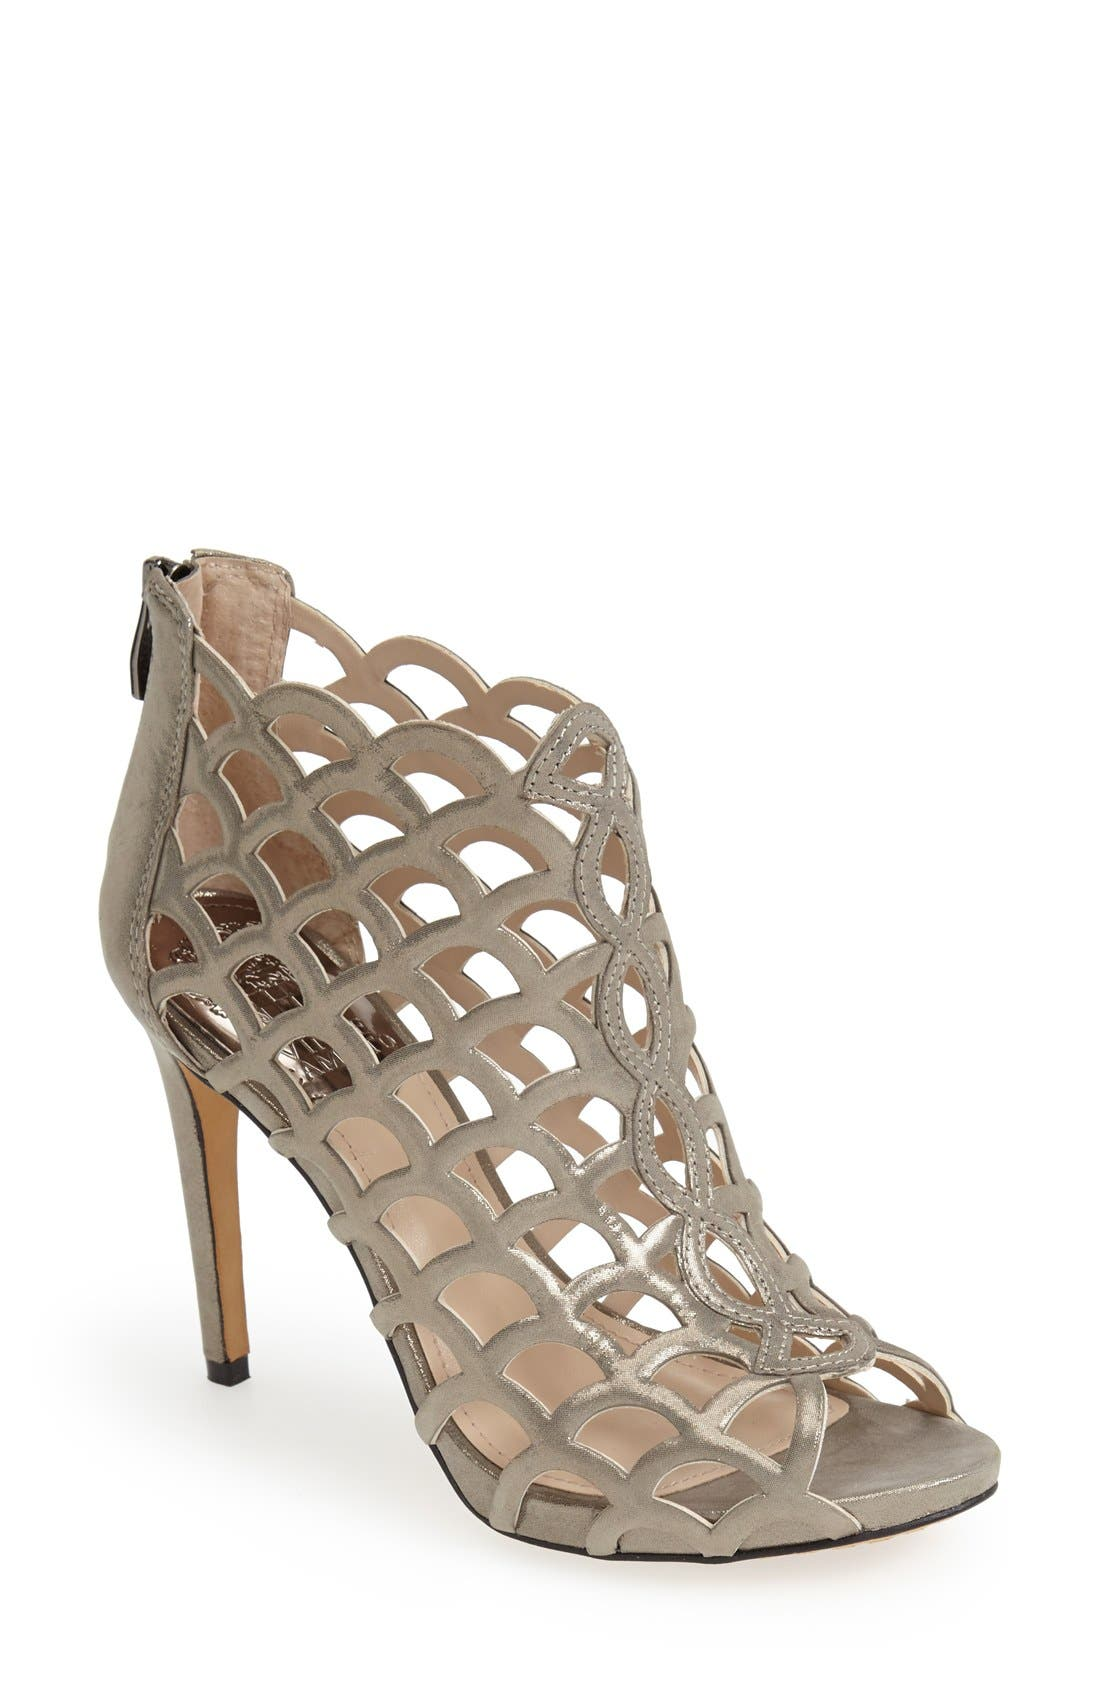 Main Image - Vince Camuto 'Fontanela' Sandal